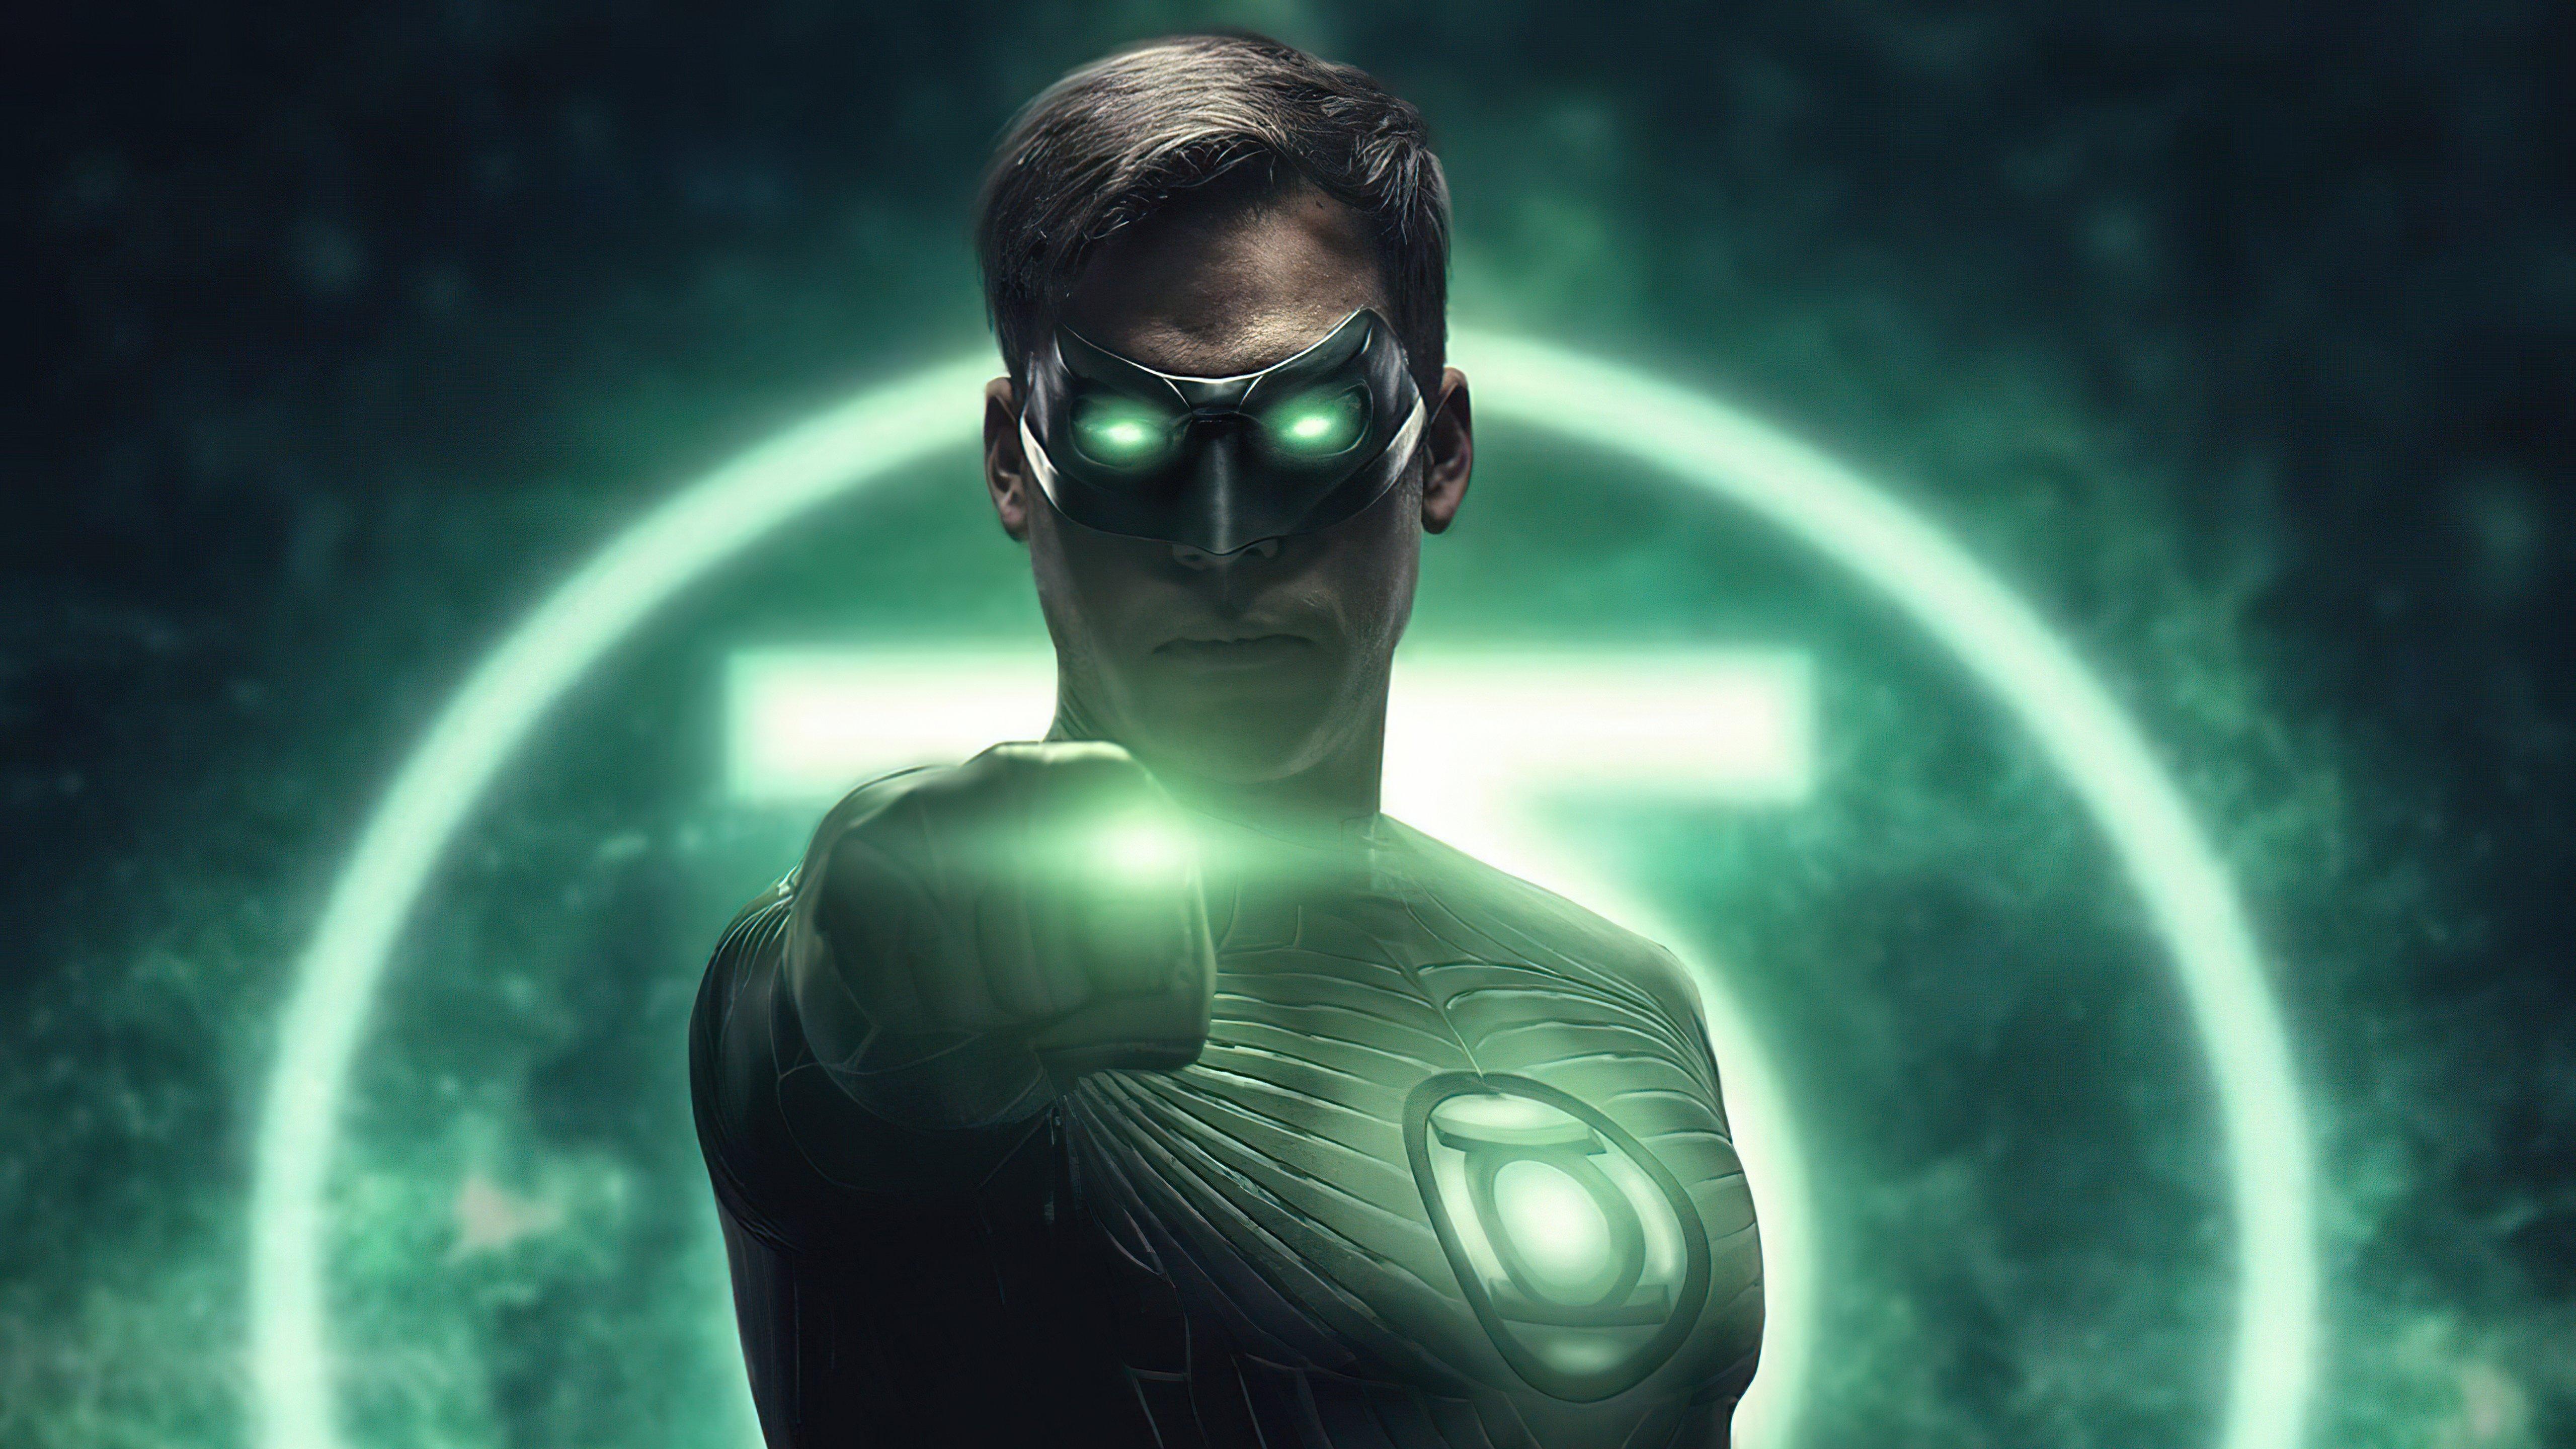 Fondos de pantalla Hal Jordan Linterna Verde